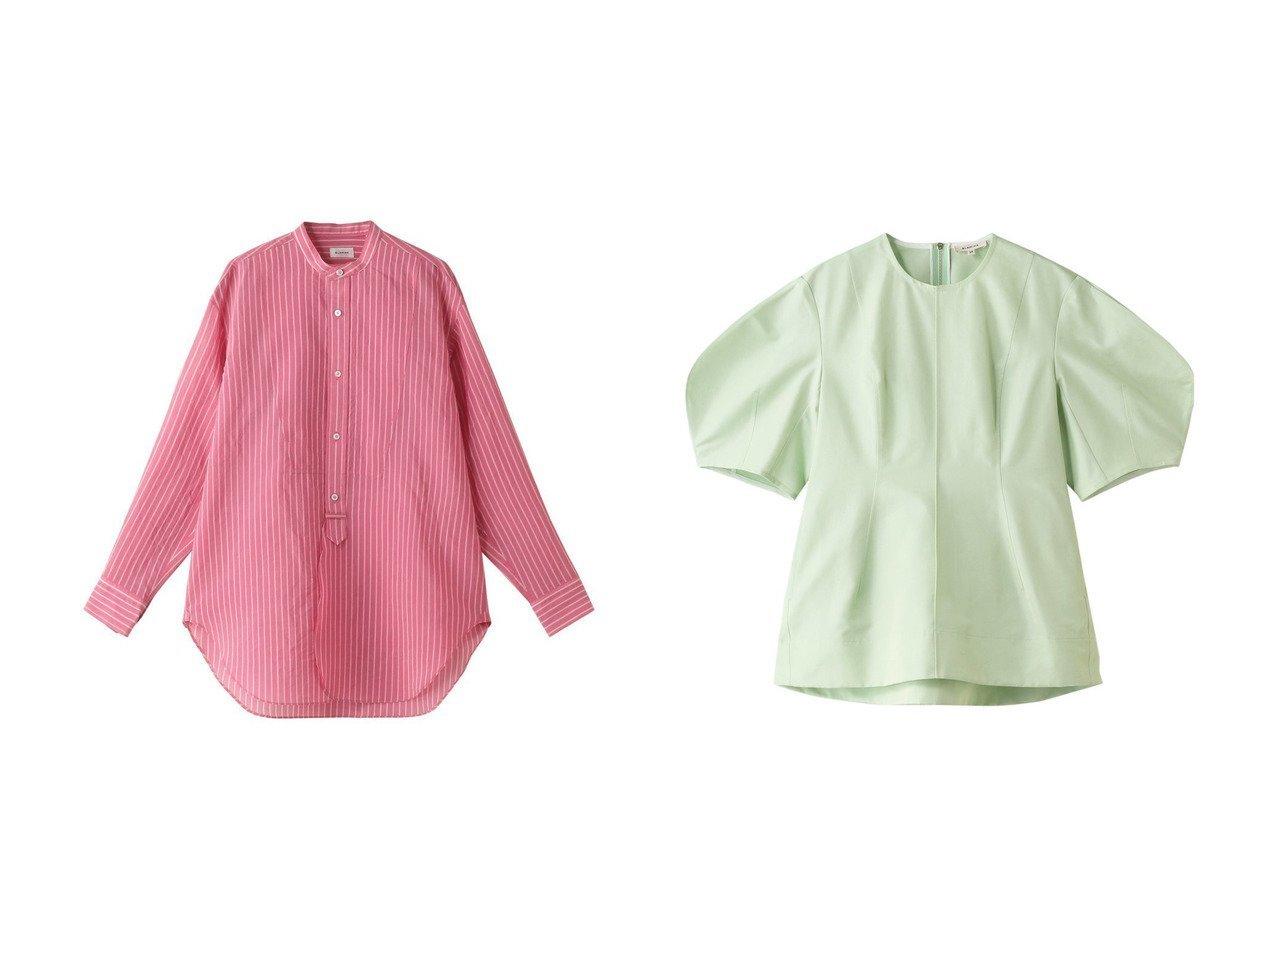 【BLAMINK/ブラミンク】のコットンシルクストライプバンドカラーシャツ&コットンシルクランタンスリーブブラウス 【トップス・カットソー】おすすめ!人気、トレンド・レディースファッションの通販  おすすめで人気の流行・トレンド、ファッションの通販商品 メンズファッション・キッズファッション・インテリア・家具・レディースファッション・服の通販 founy(ファニー) https://founy.com/ ファッション Fashion レディースファッション WOMEN トップス・カットソー Tops/Tshirt シャツ/ブラウス Shirts/Blouses 2021年 2021 2021春夏・S/S SS/Spring/Summer/2021 S/S・春夏 SS・Spring/Summer シェイプ ショート シルク スリーブ パーティ 春 Spring |ID:crp329100000027099